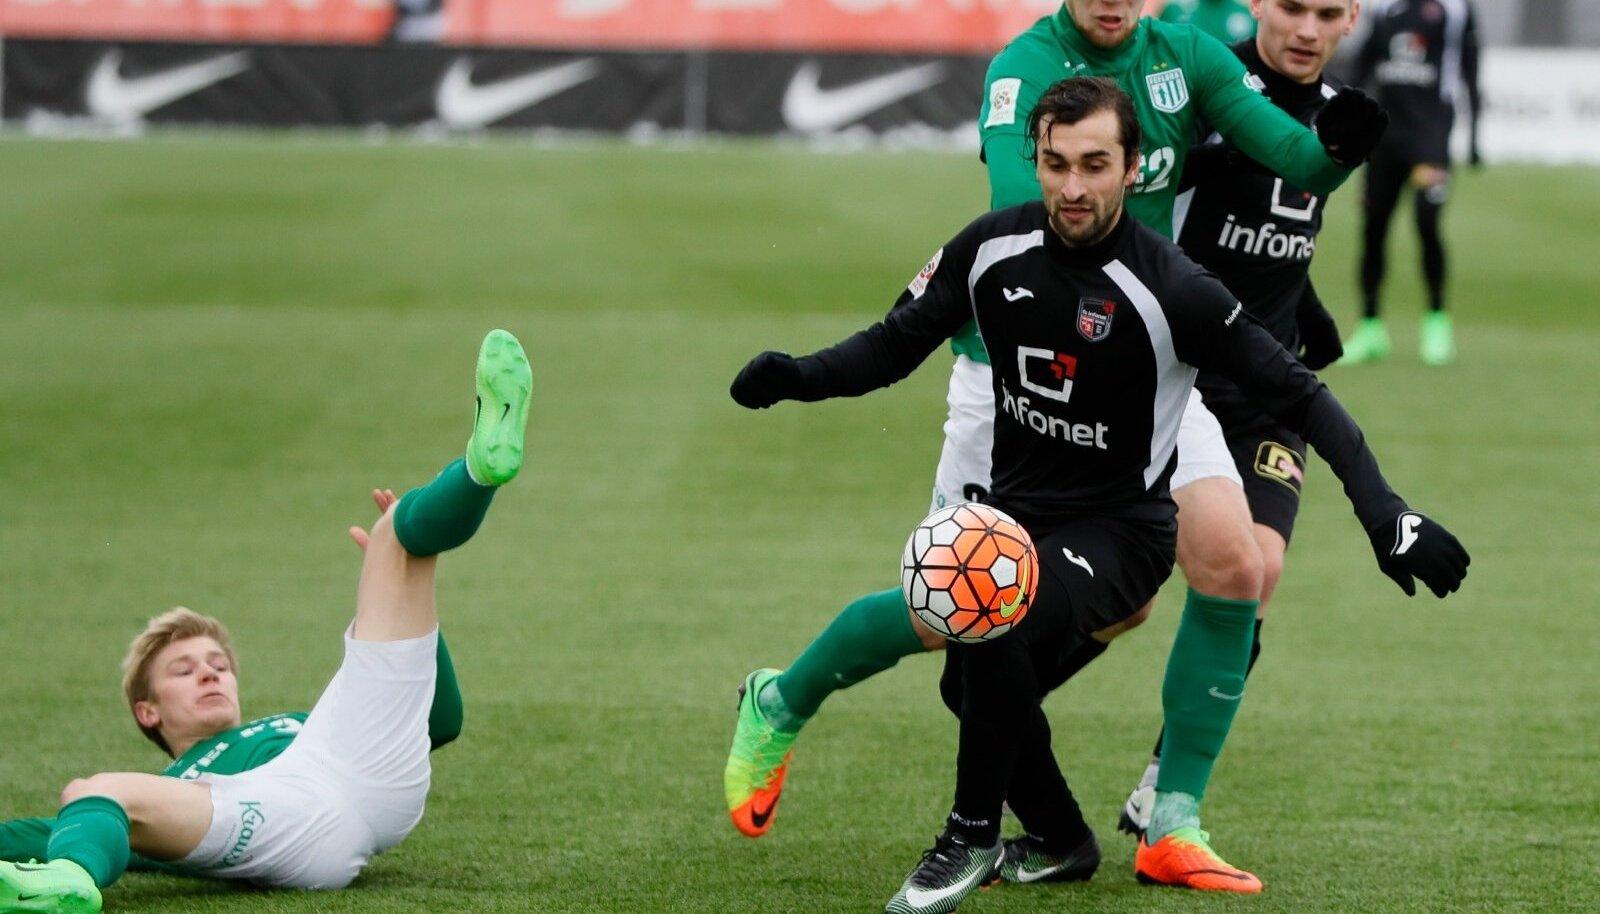 FC Flora vs FC Infonet